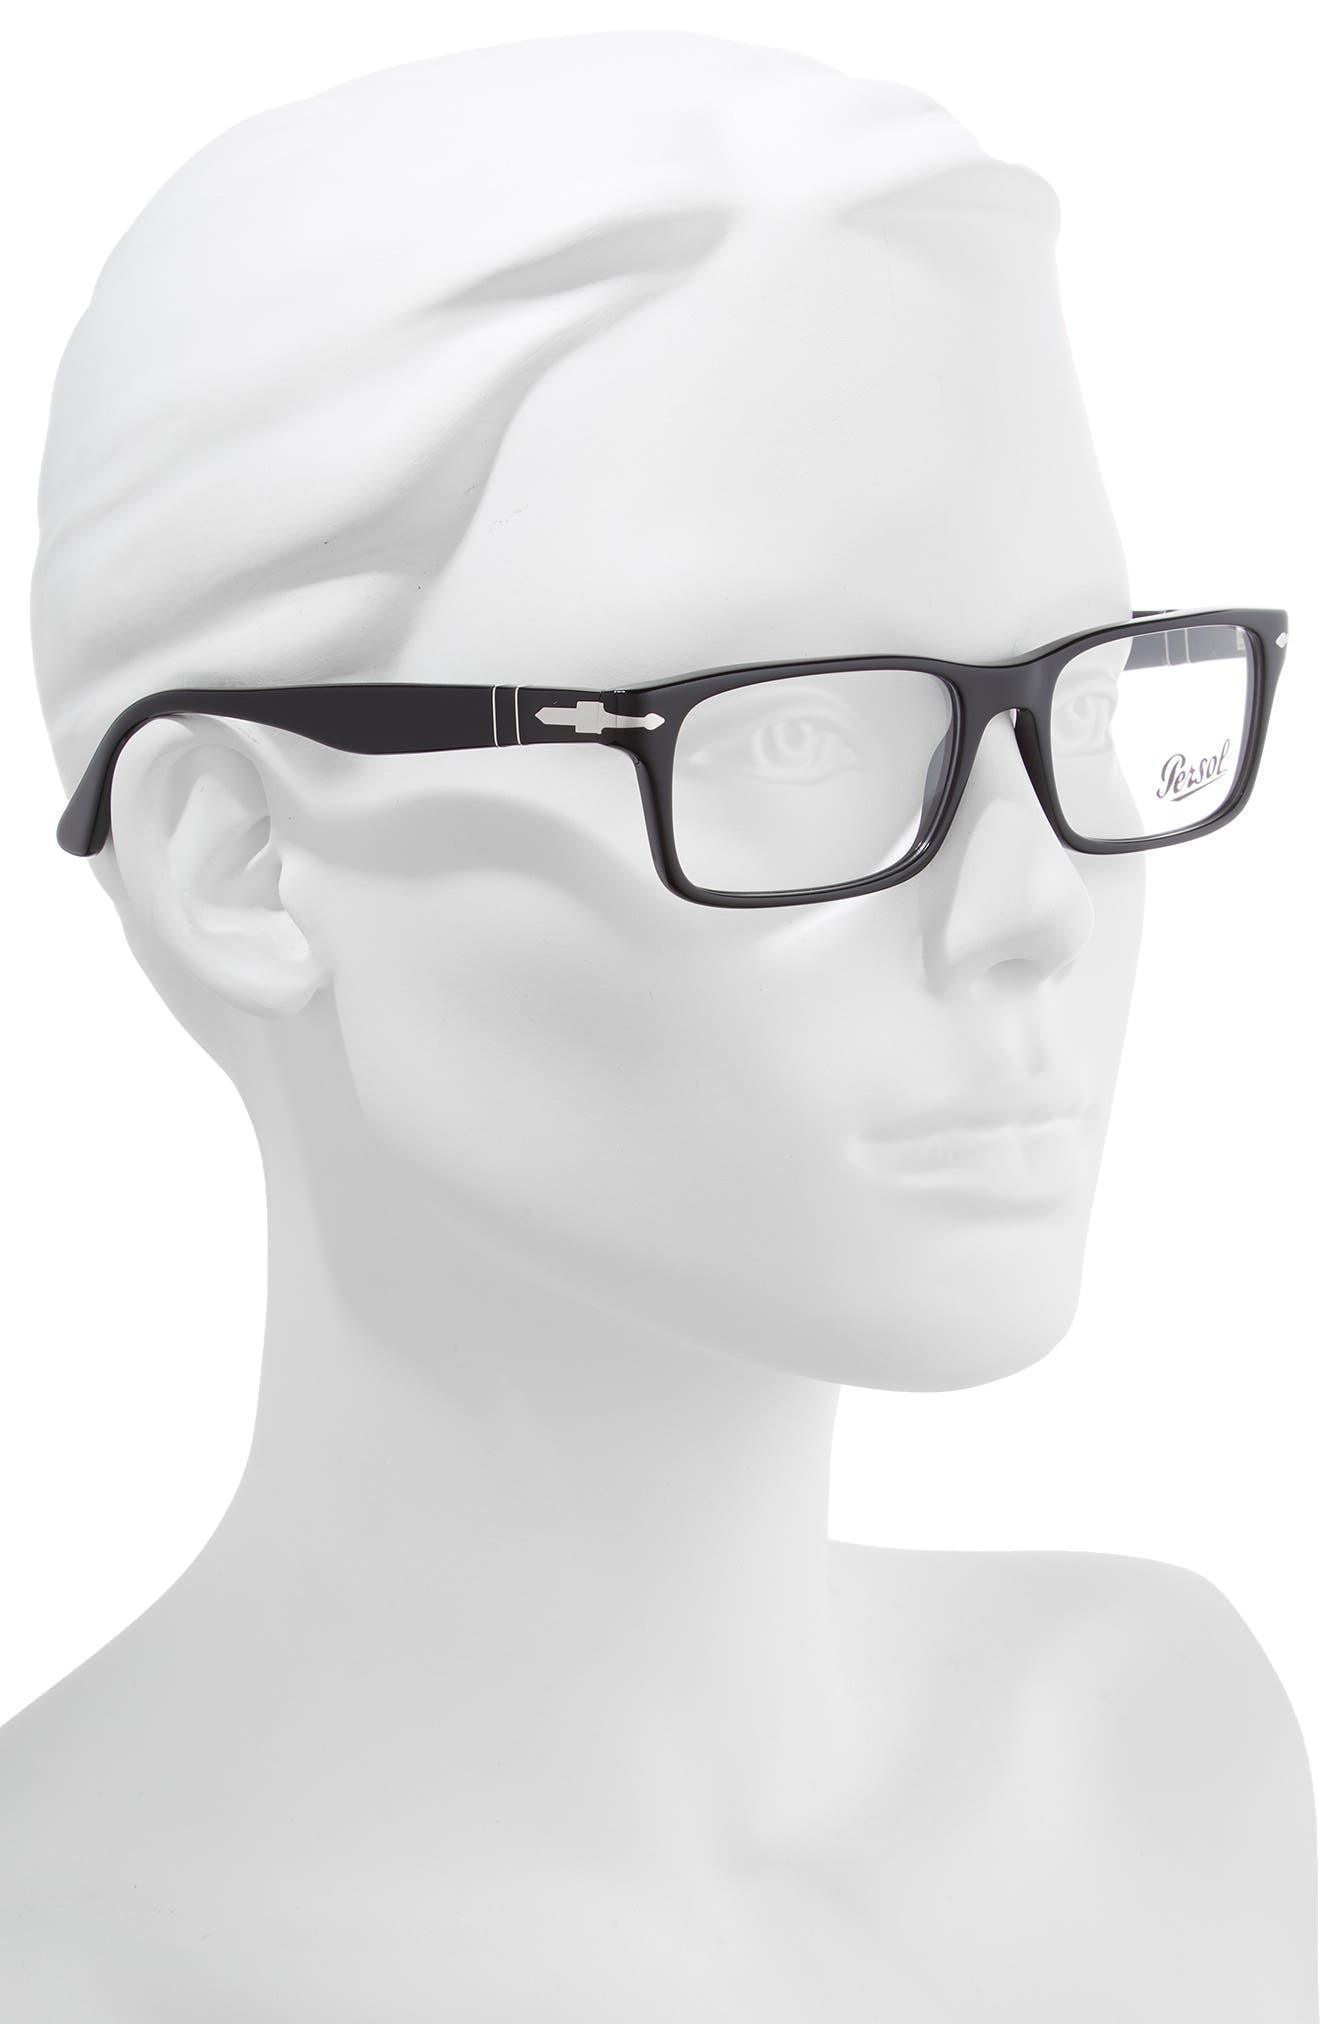 55mm Rectangle Optical Glasses,                             Alternate thumbnail 2, color,                             BLACK